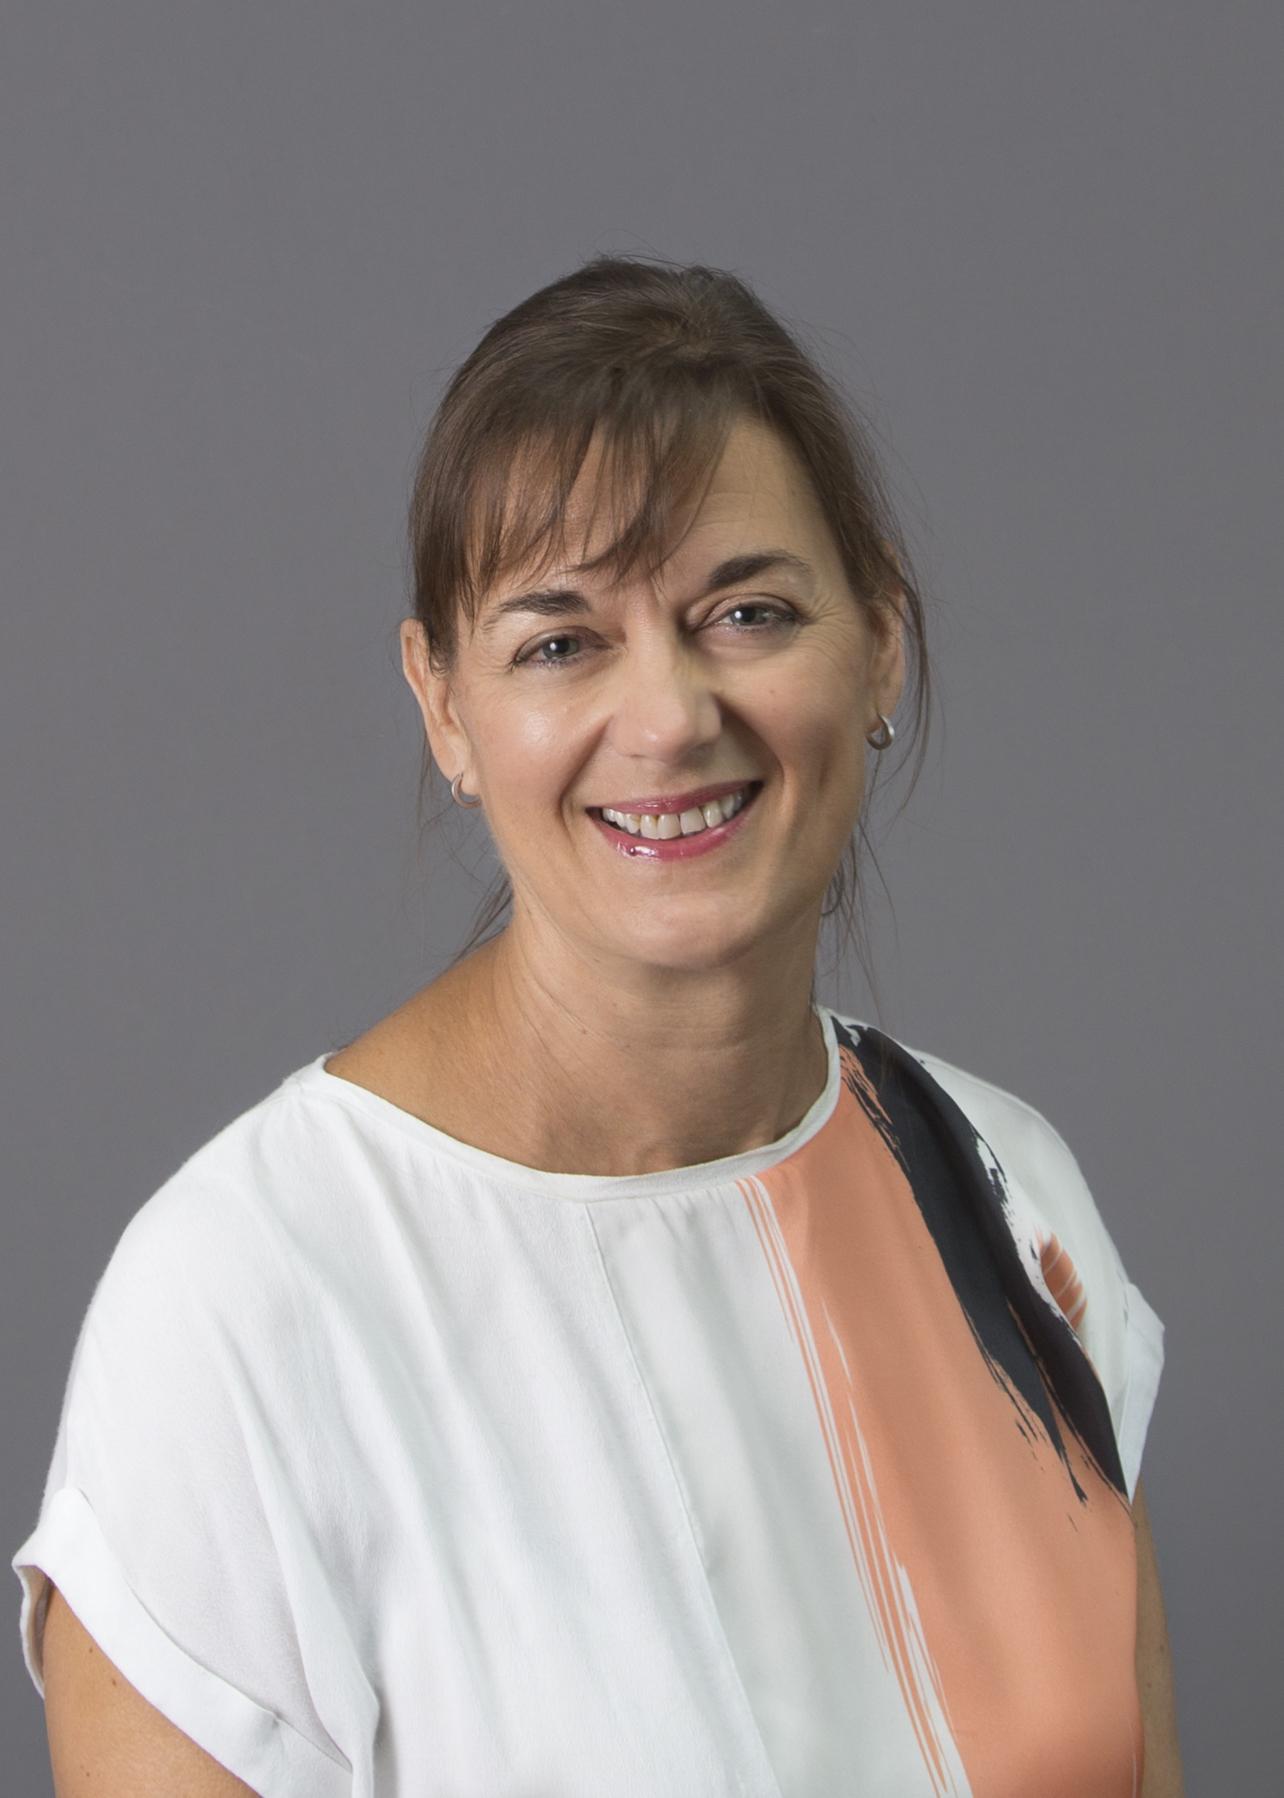 Antonia Lord